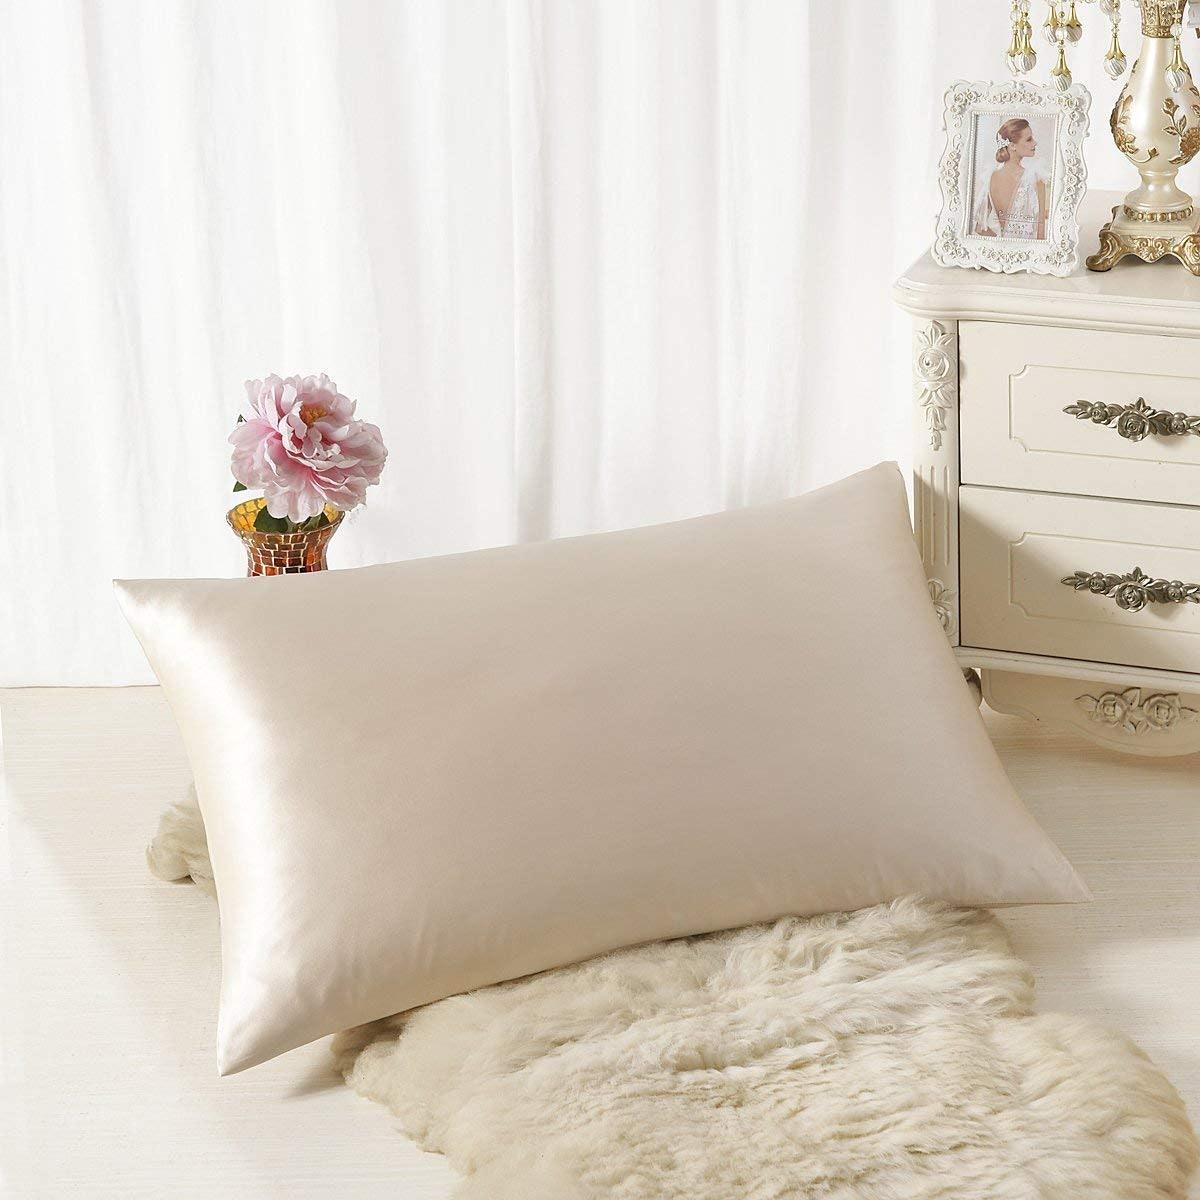 ALASKA BEAR - Natural Silk Pillowcase